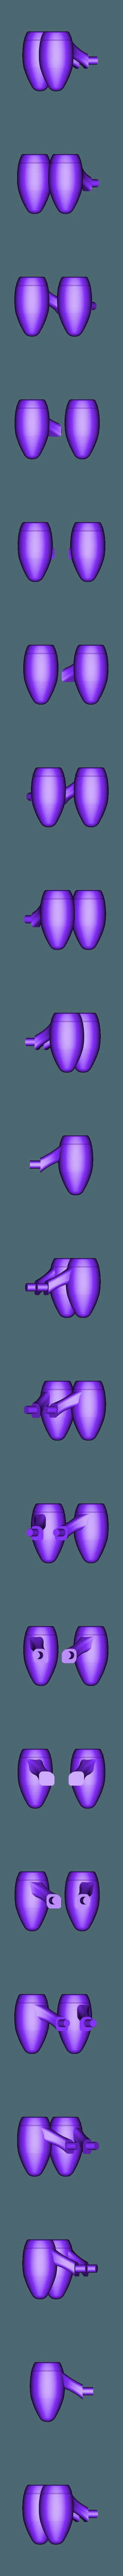 75trk2headlightS.stl Download STL file Ratrod Pickup • 3D printing template, macone1